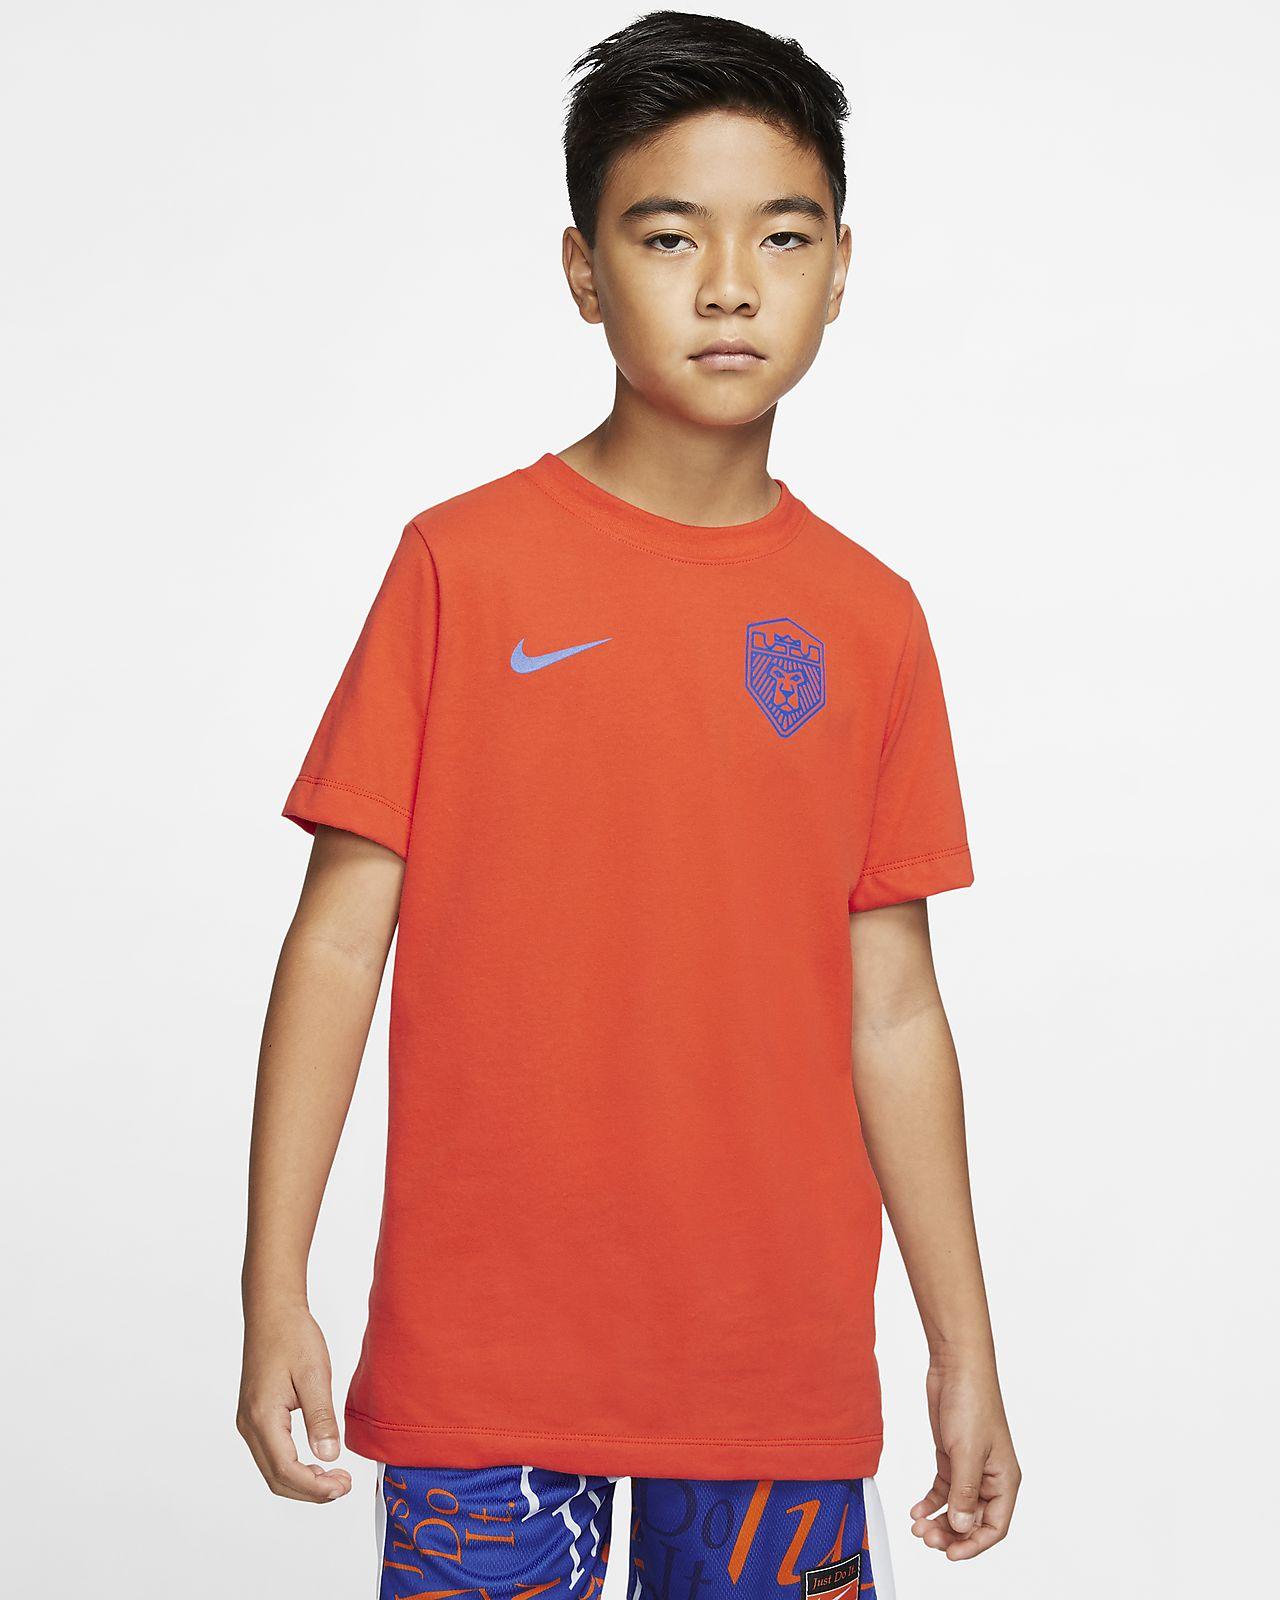 Nike Dri-FIT LeBron Big Kids' (Boys') Training T-Shirt